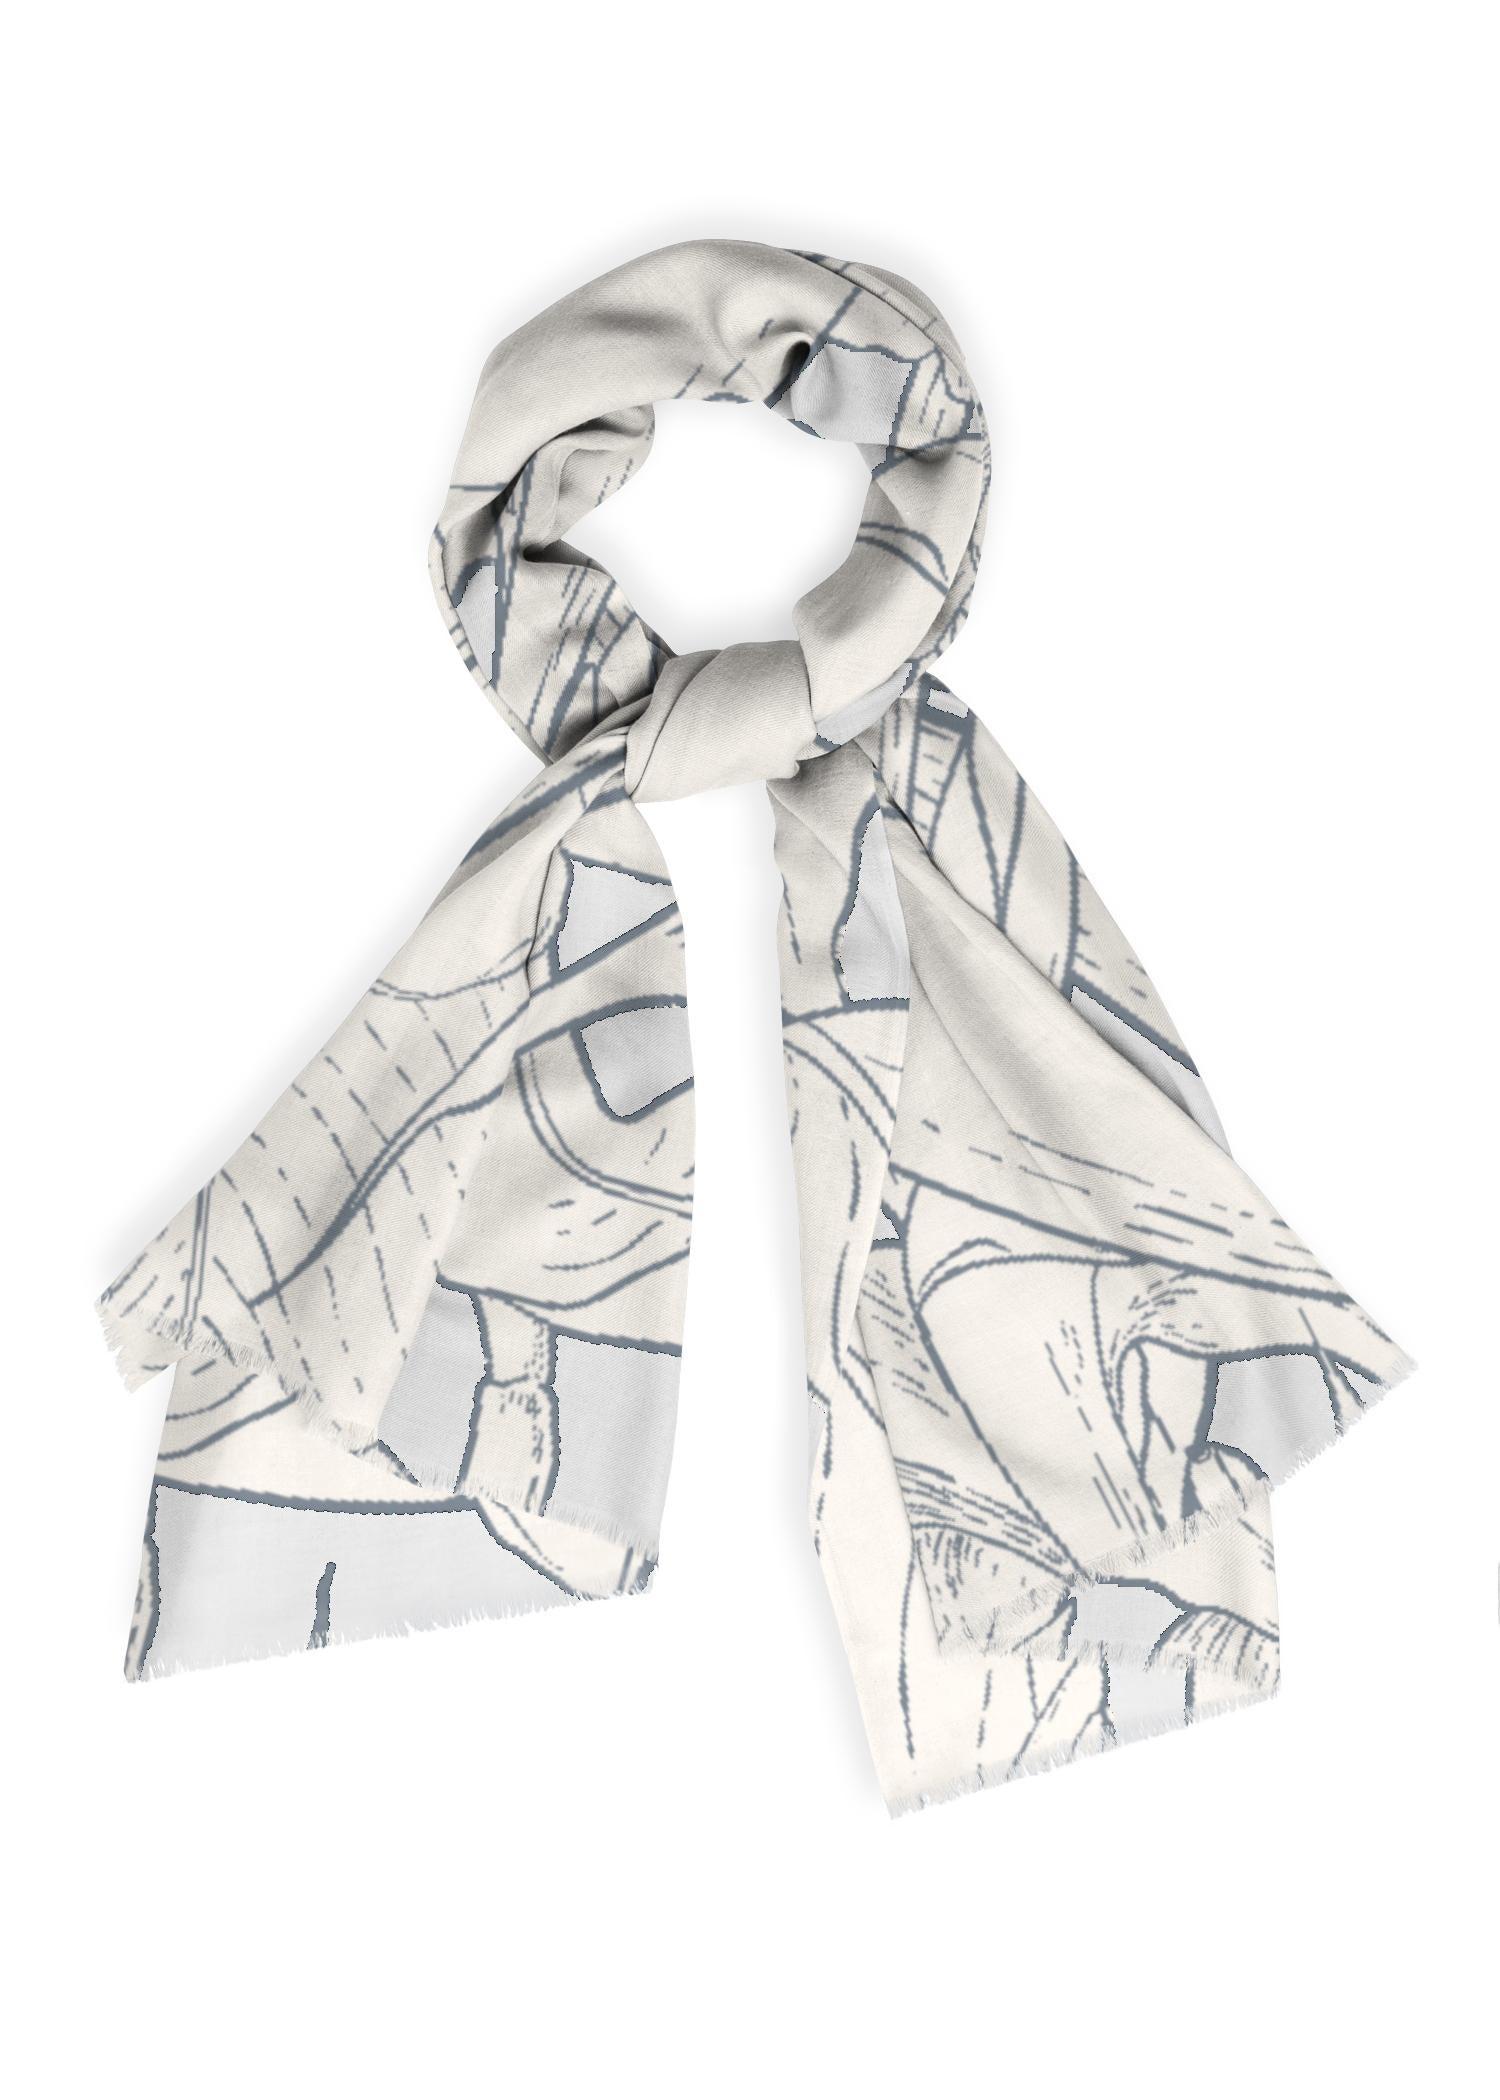 VIDA Cashmere Silk Scarf - Monochrome Garden by VIDA Original Artist  - Size: One Size